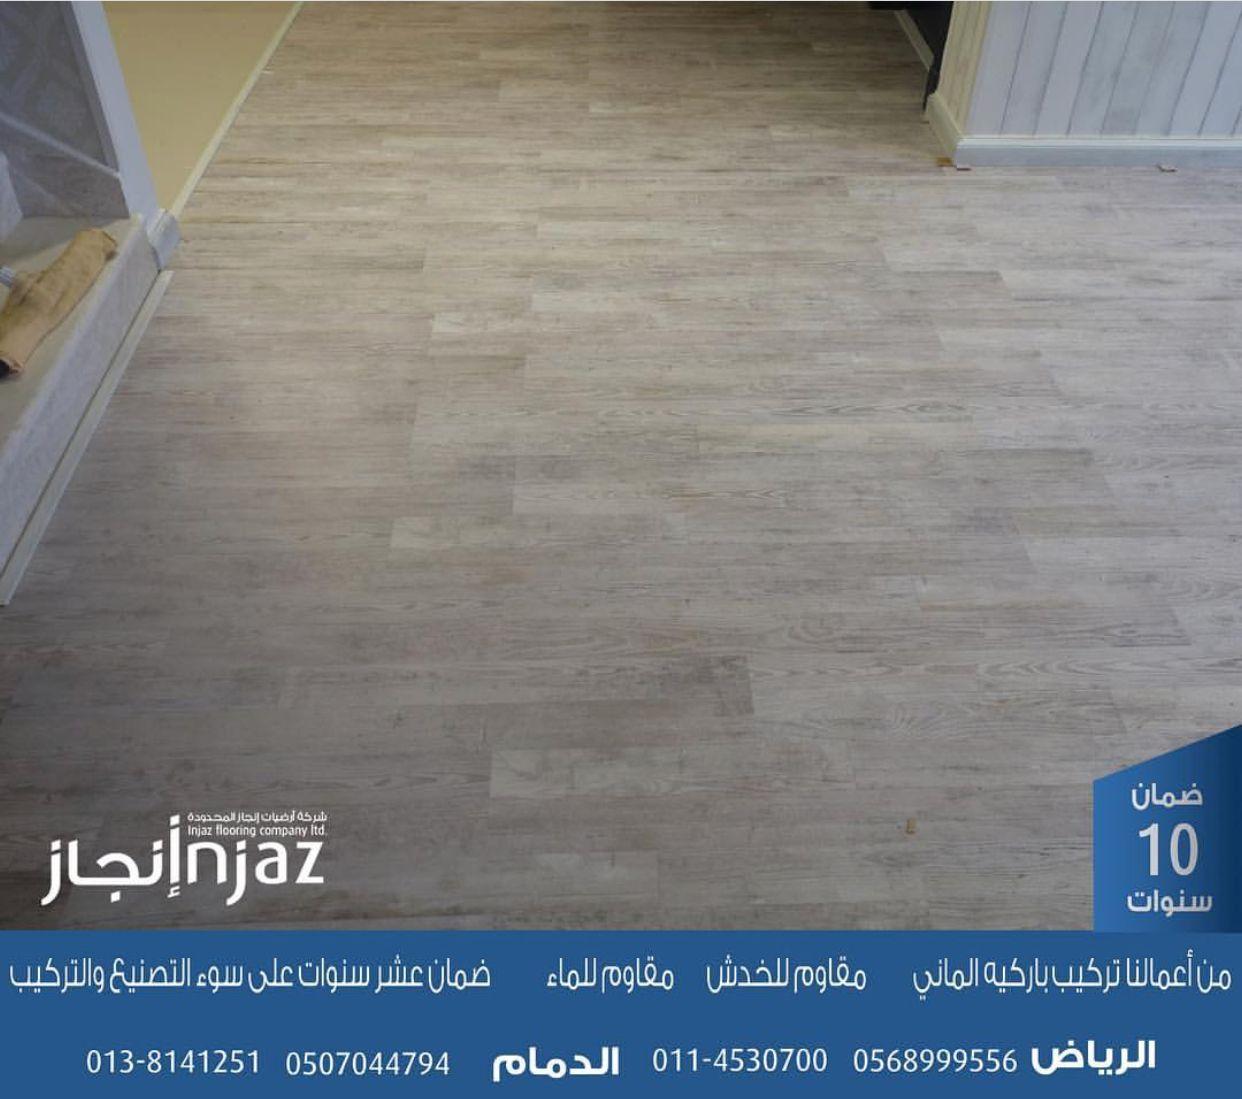 باركيه انجاز الماني Wood Laminate Flooring Laminate Flooring Wood Laminate